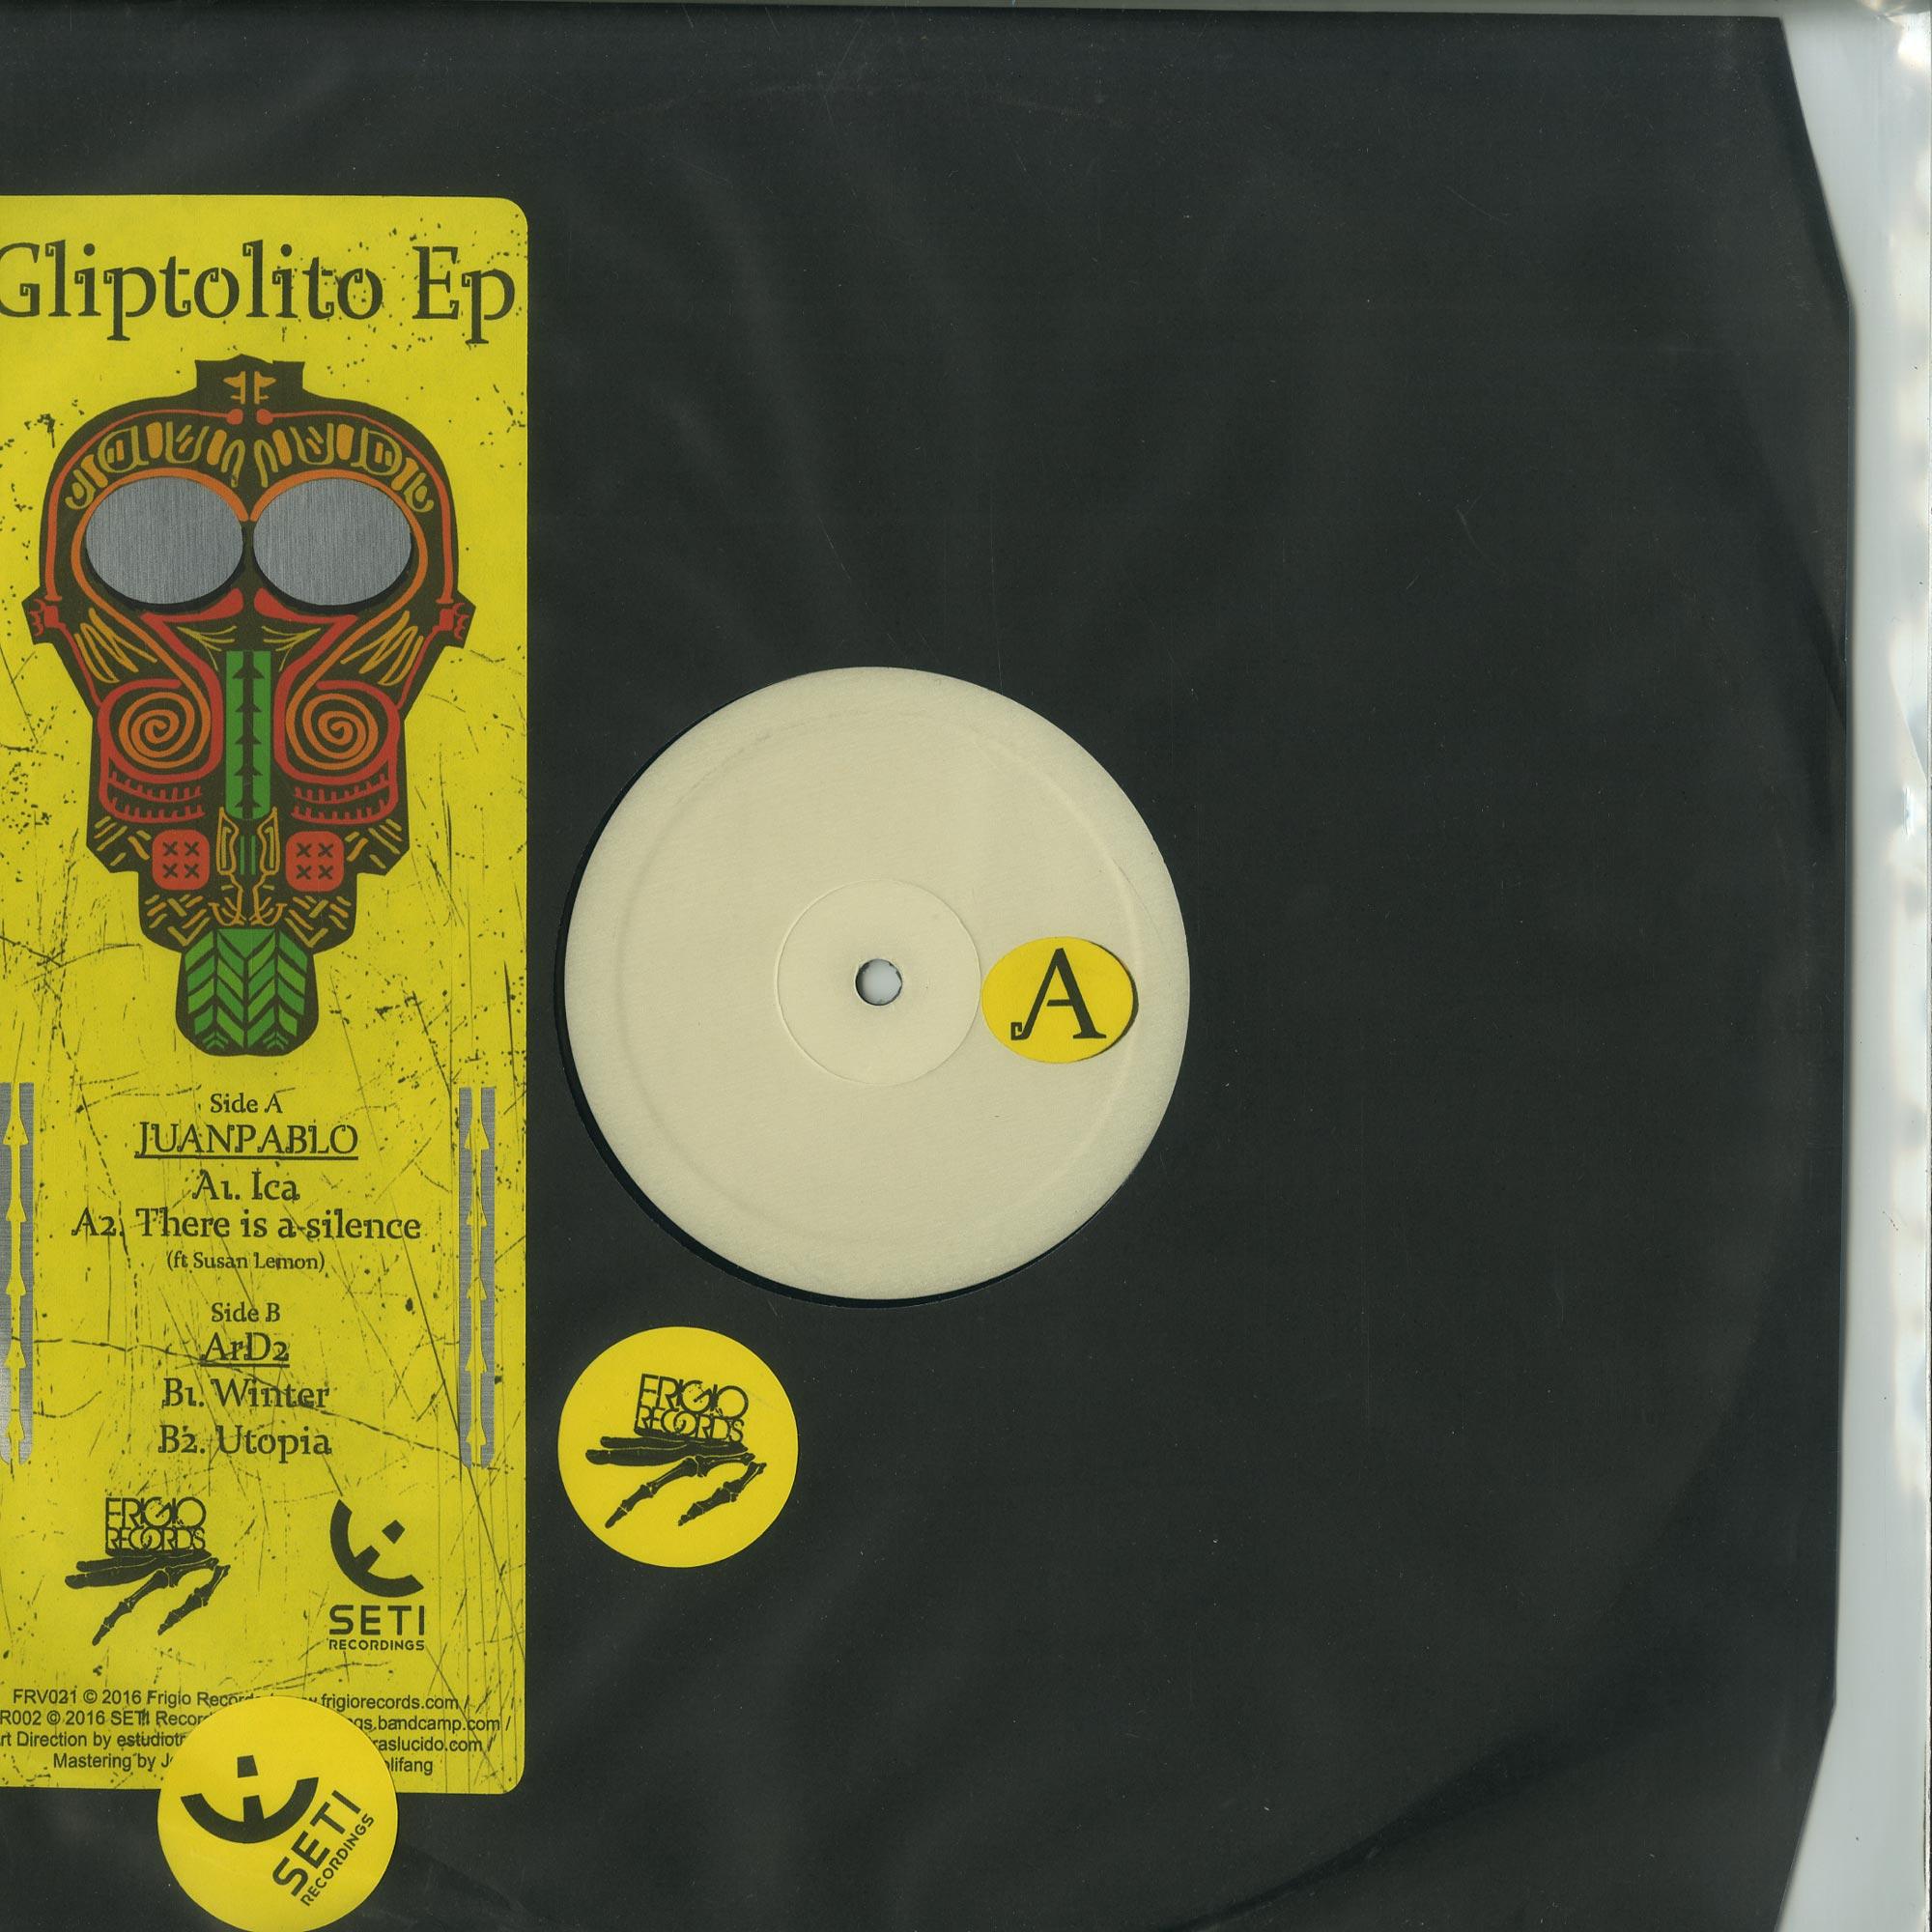 Juanpablo / ArD2 - GLIPTOLITO